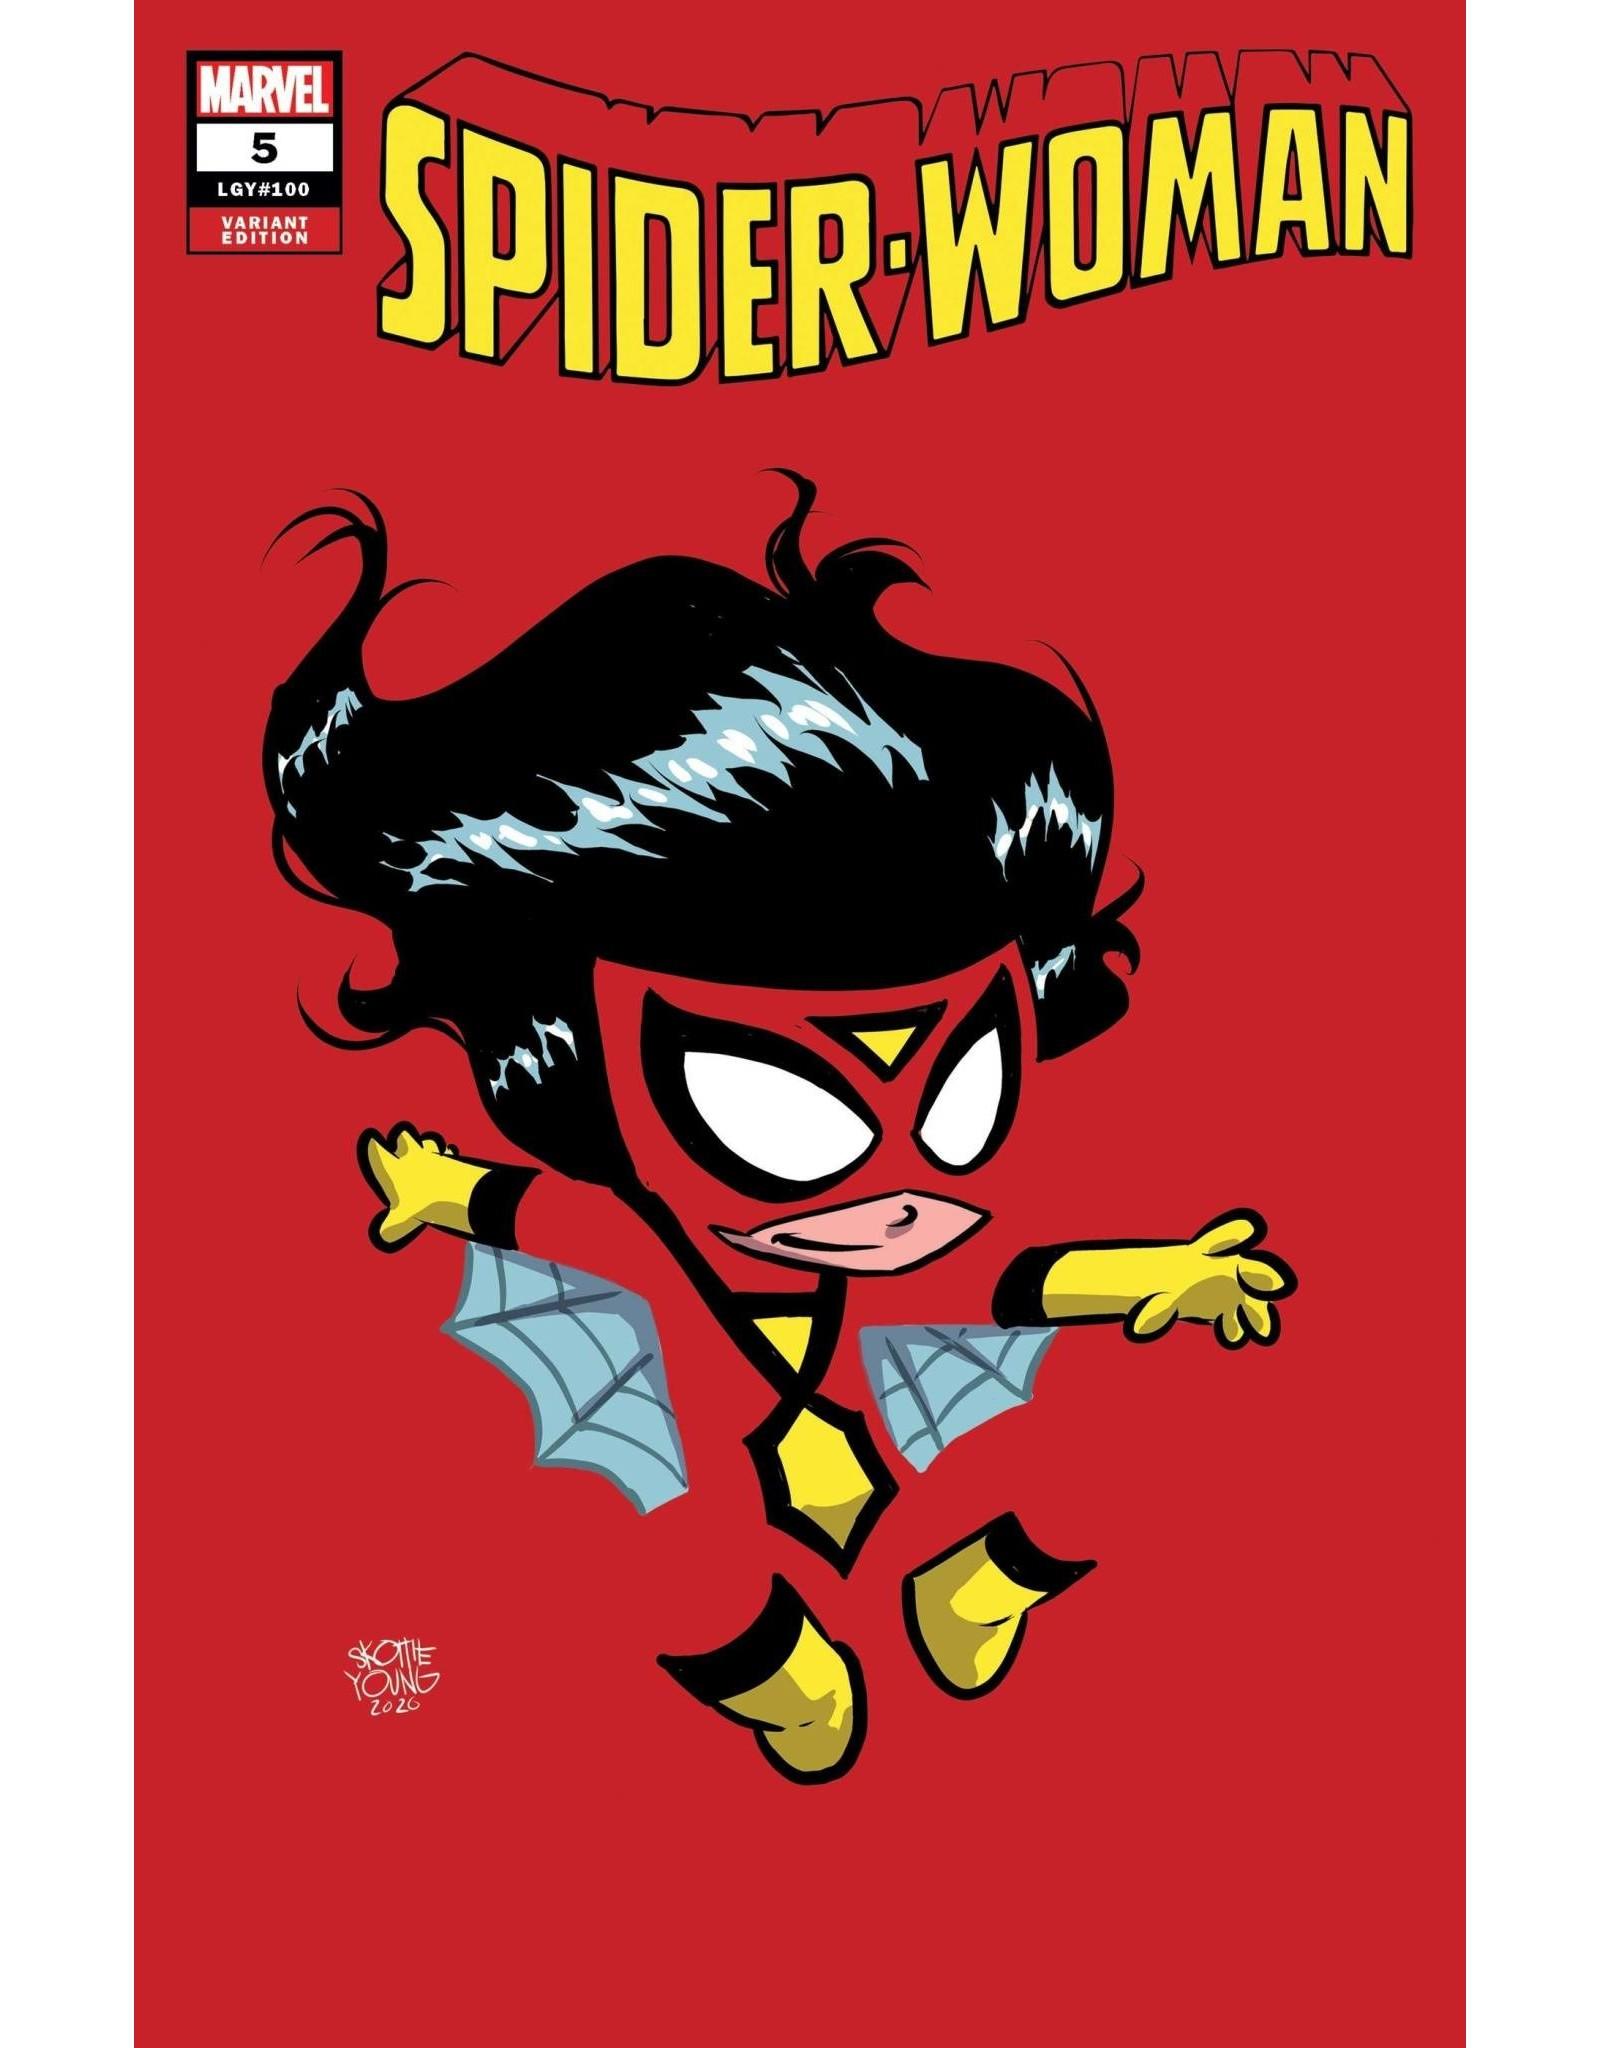 Marvel Comics SPIDER-WOMAN #5 YOUNG VAR